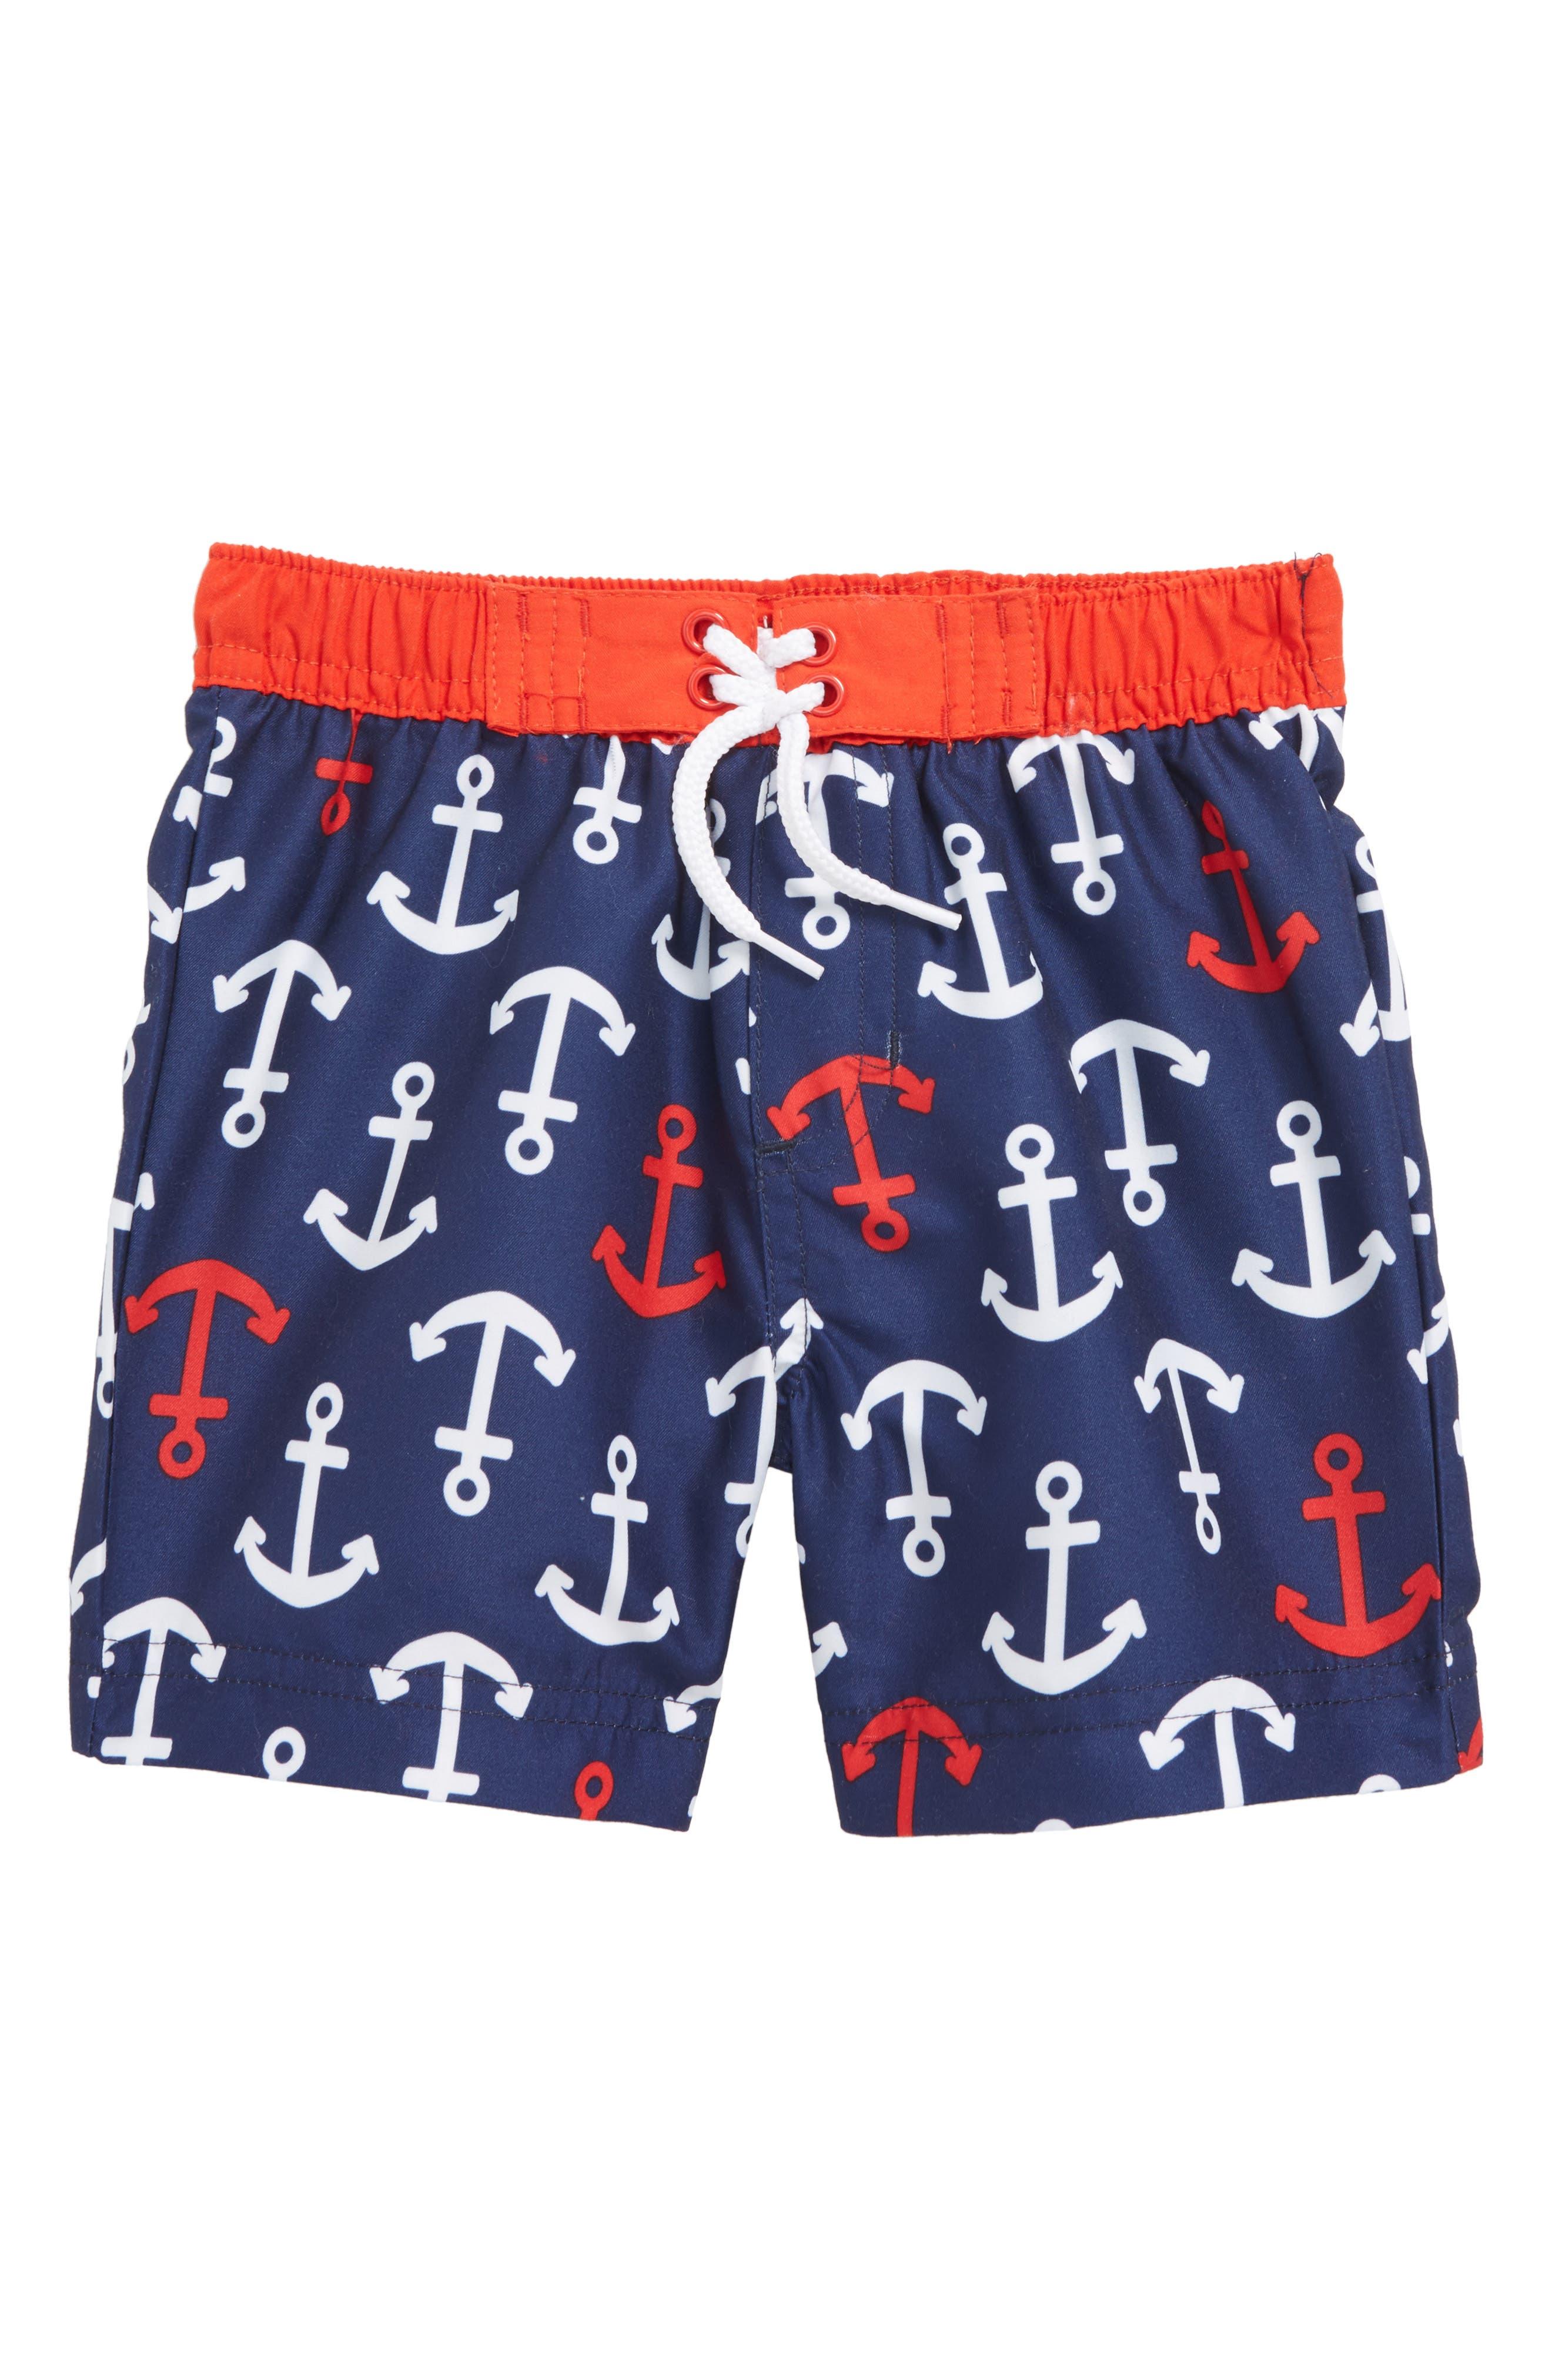 Anchor Swim Trunks,                         Main,                         color, 415